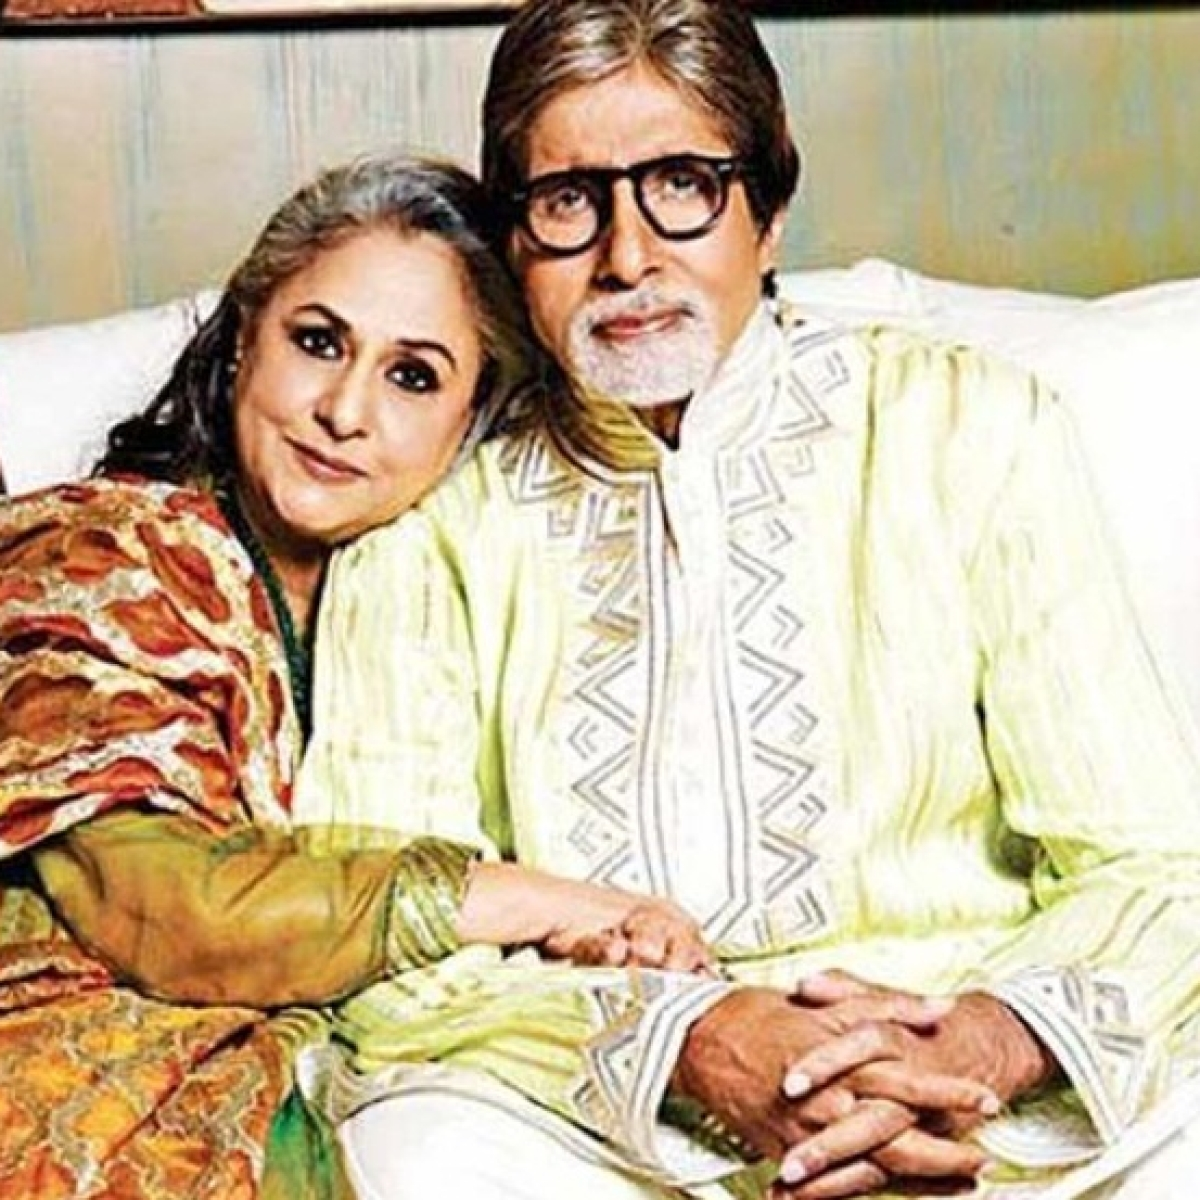 Amitabh Bachchan shares throwback pic of Jaya Bachchan in Swami Vivekanand's avatar